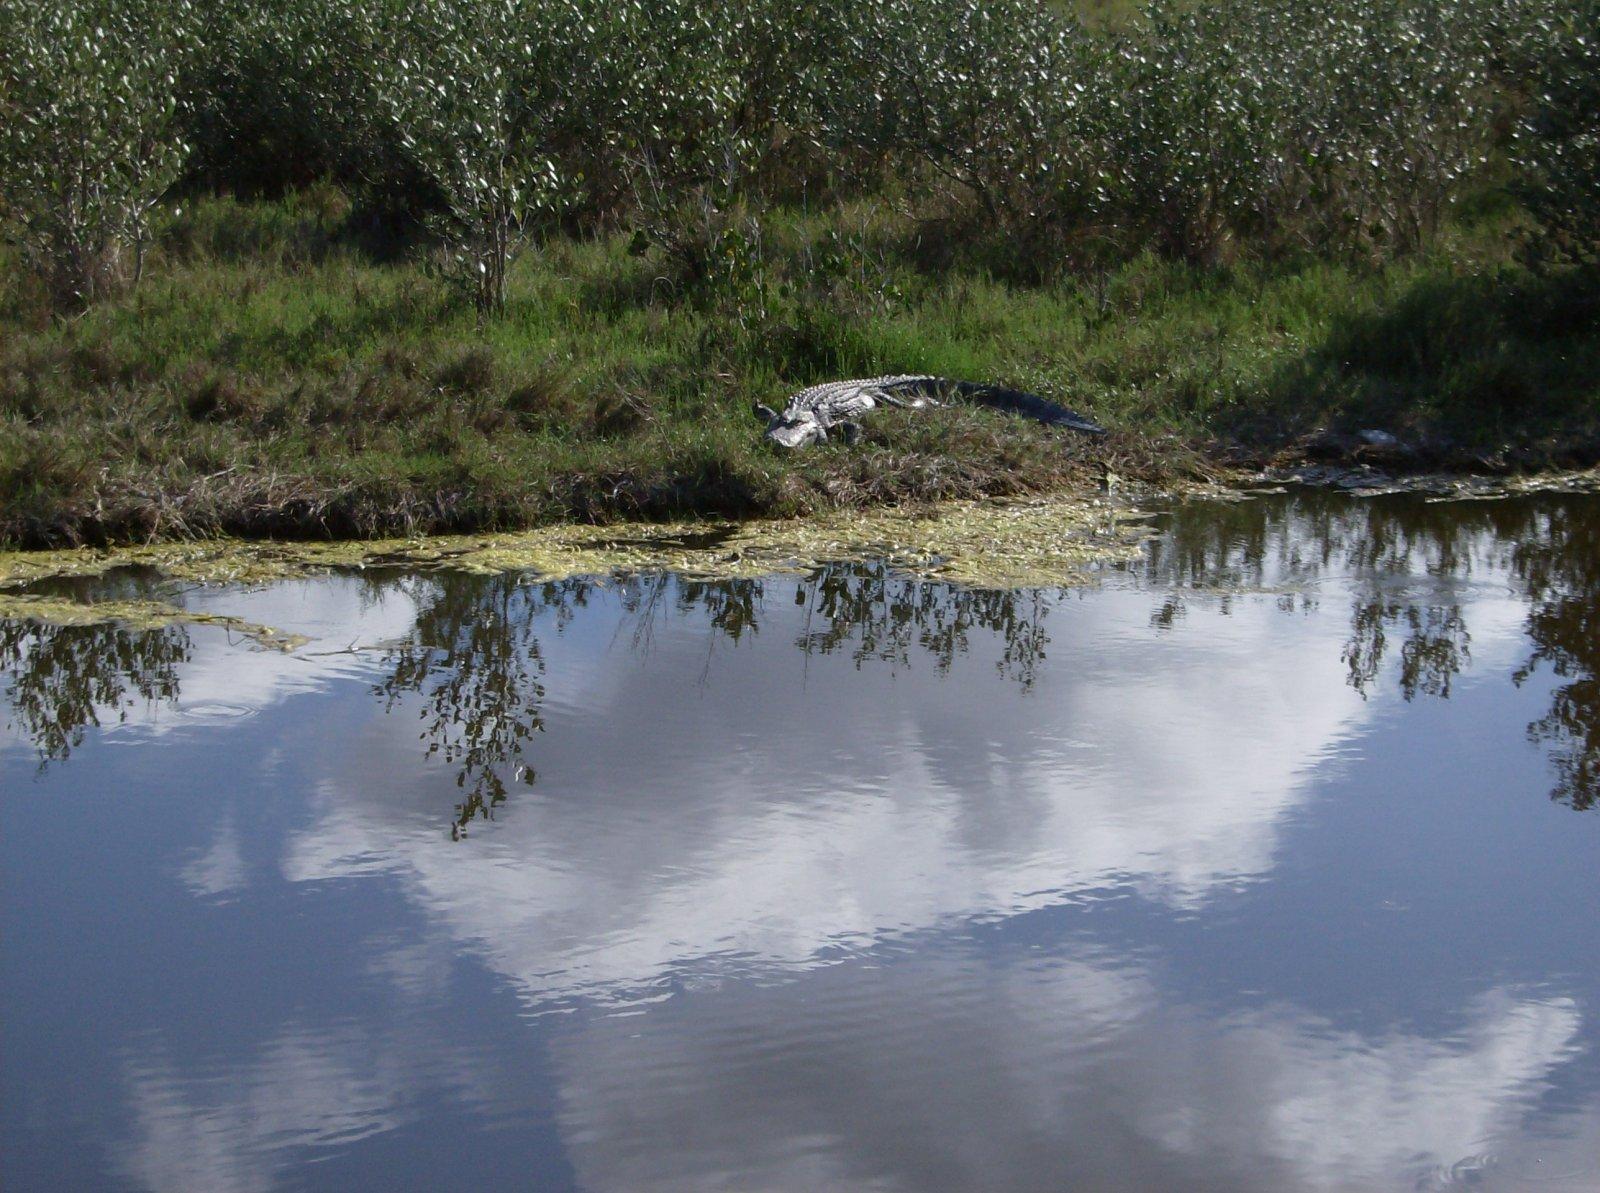 Click image for larger version  Name:Playalina Beach & Florida Gators 009.jpg Views:78 Size:361.2 KB ID:153352